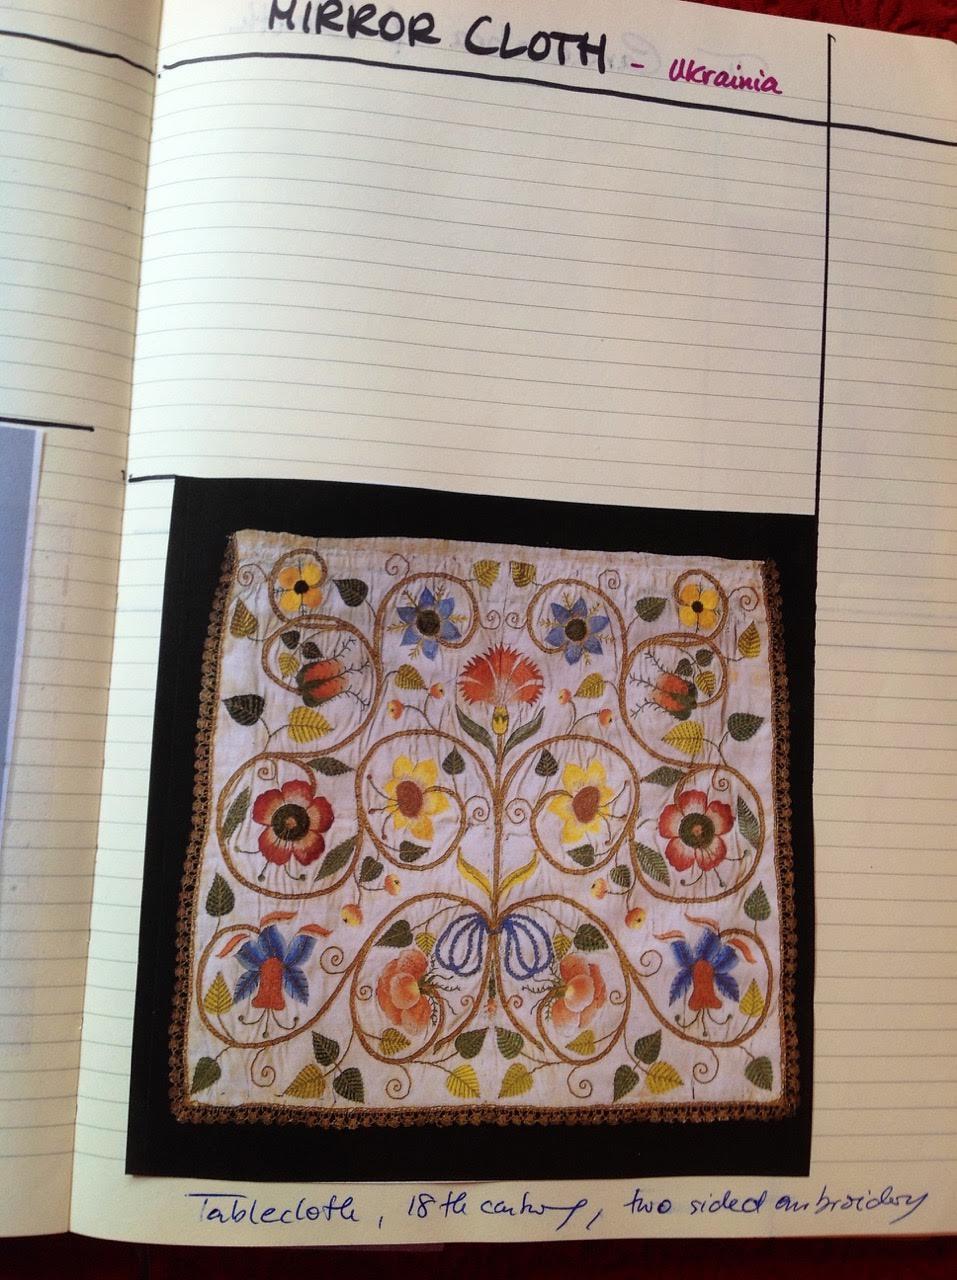 C notebook_mirror cloth.jpg